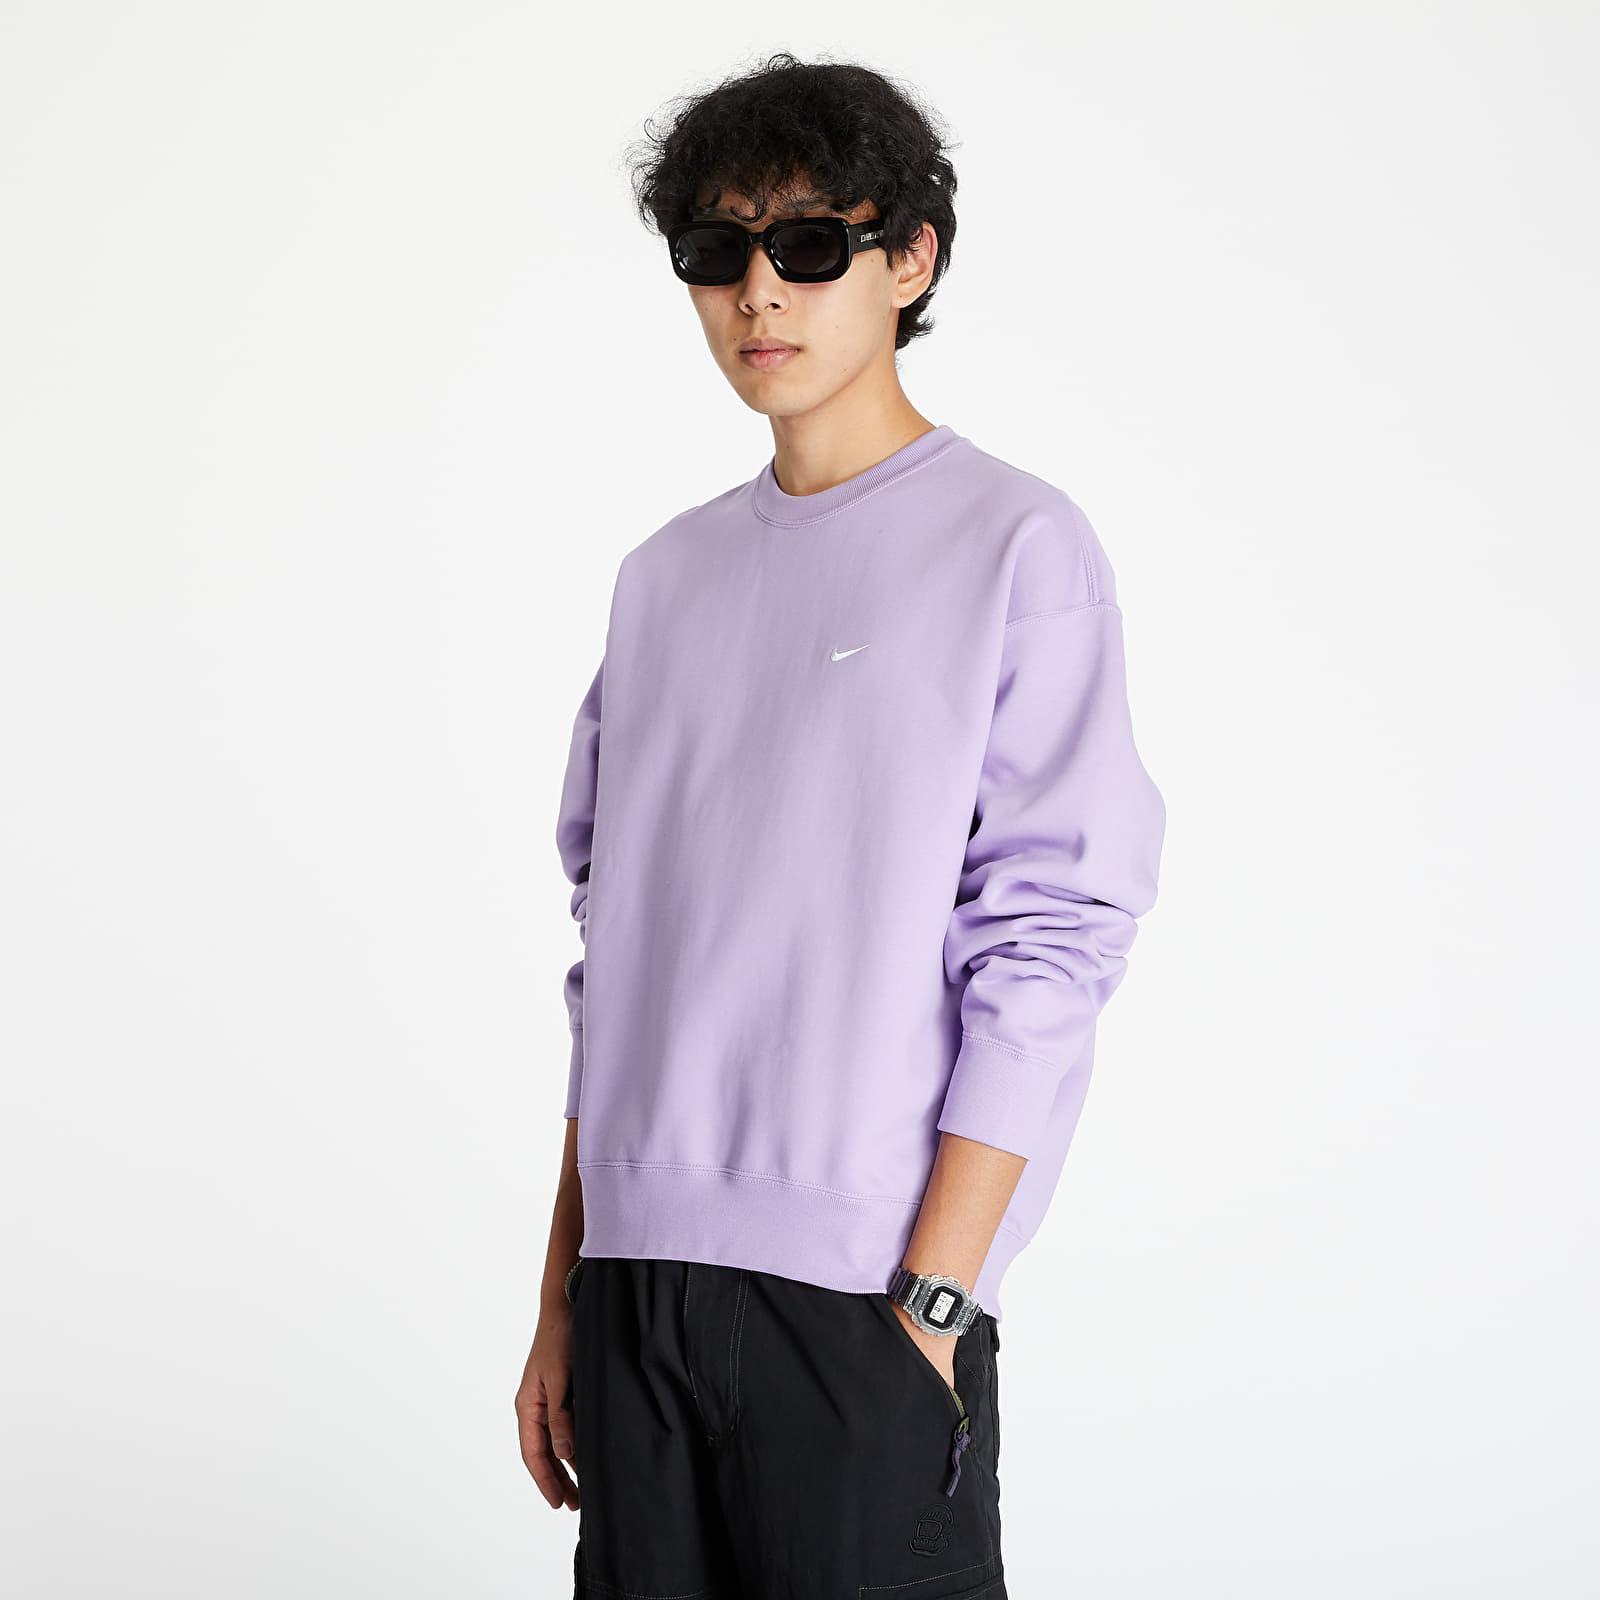 Sweatshirts Nike Nrg SoloSwoosh Crew Fleece Urban Lilac/ White